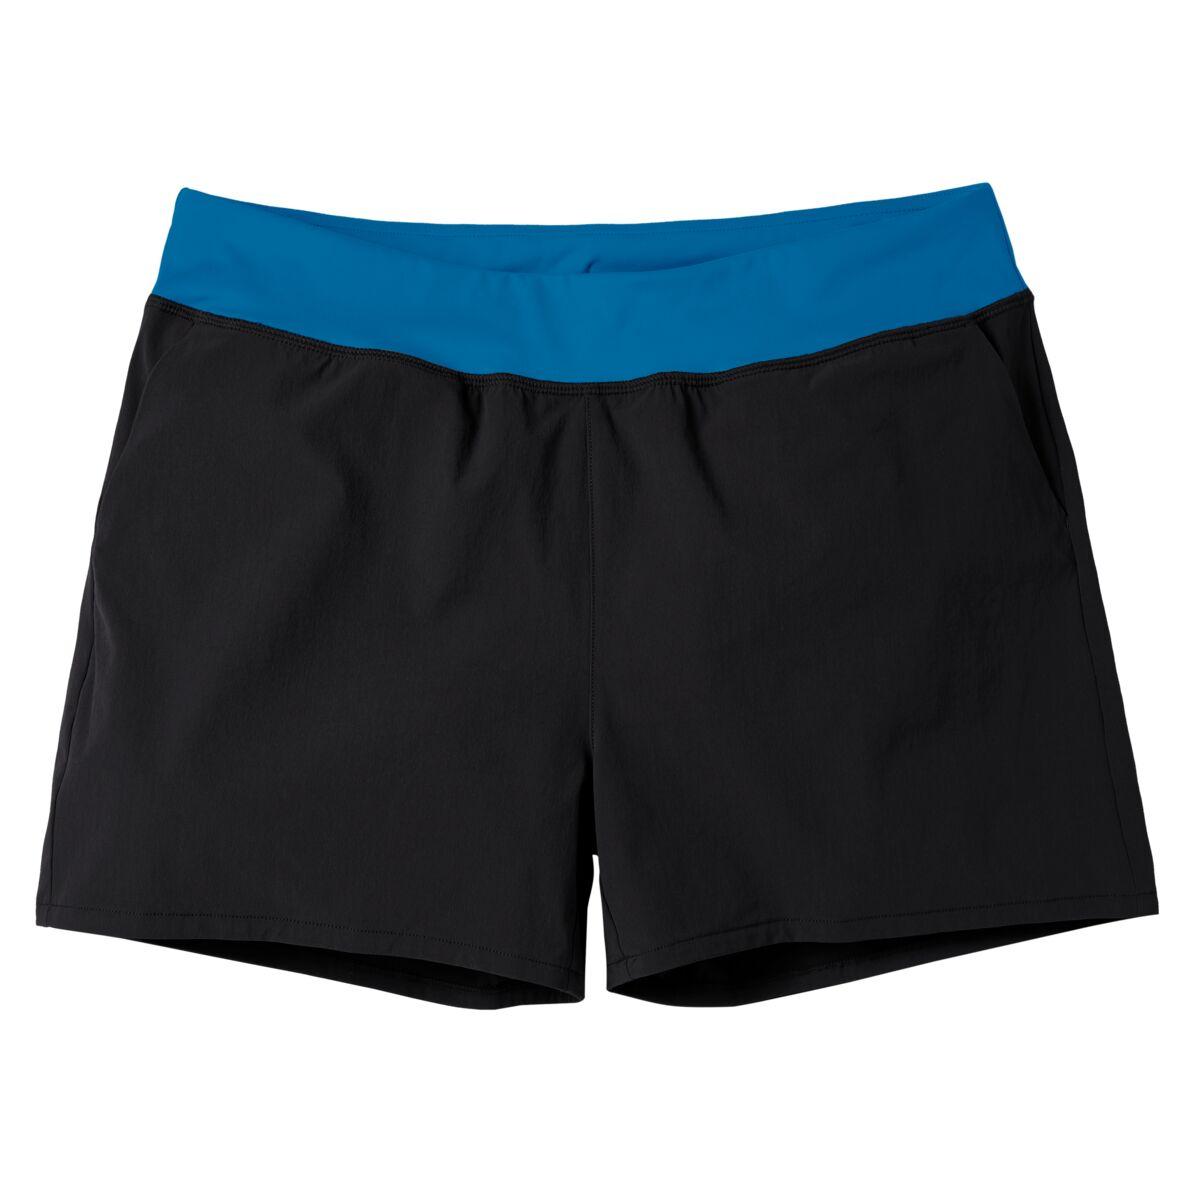 Cotopaxi-Vamos Hybrid Short - Women's